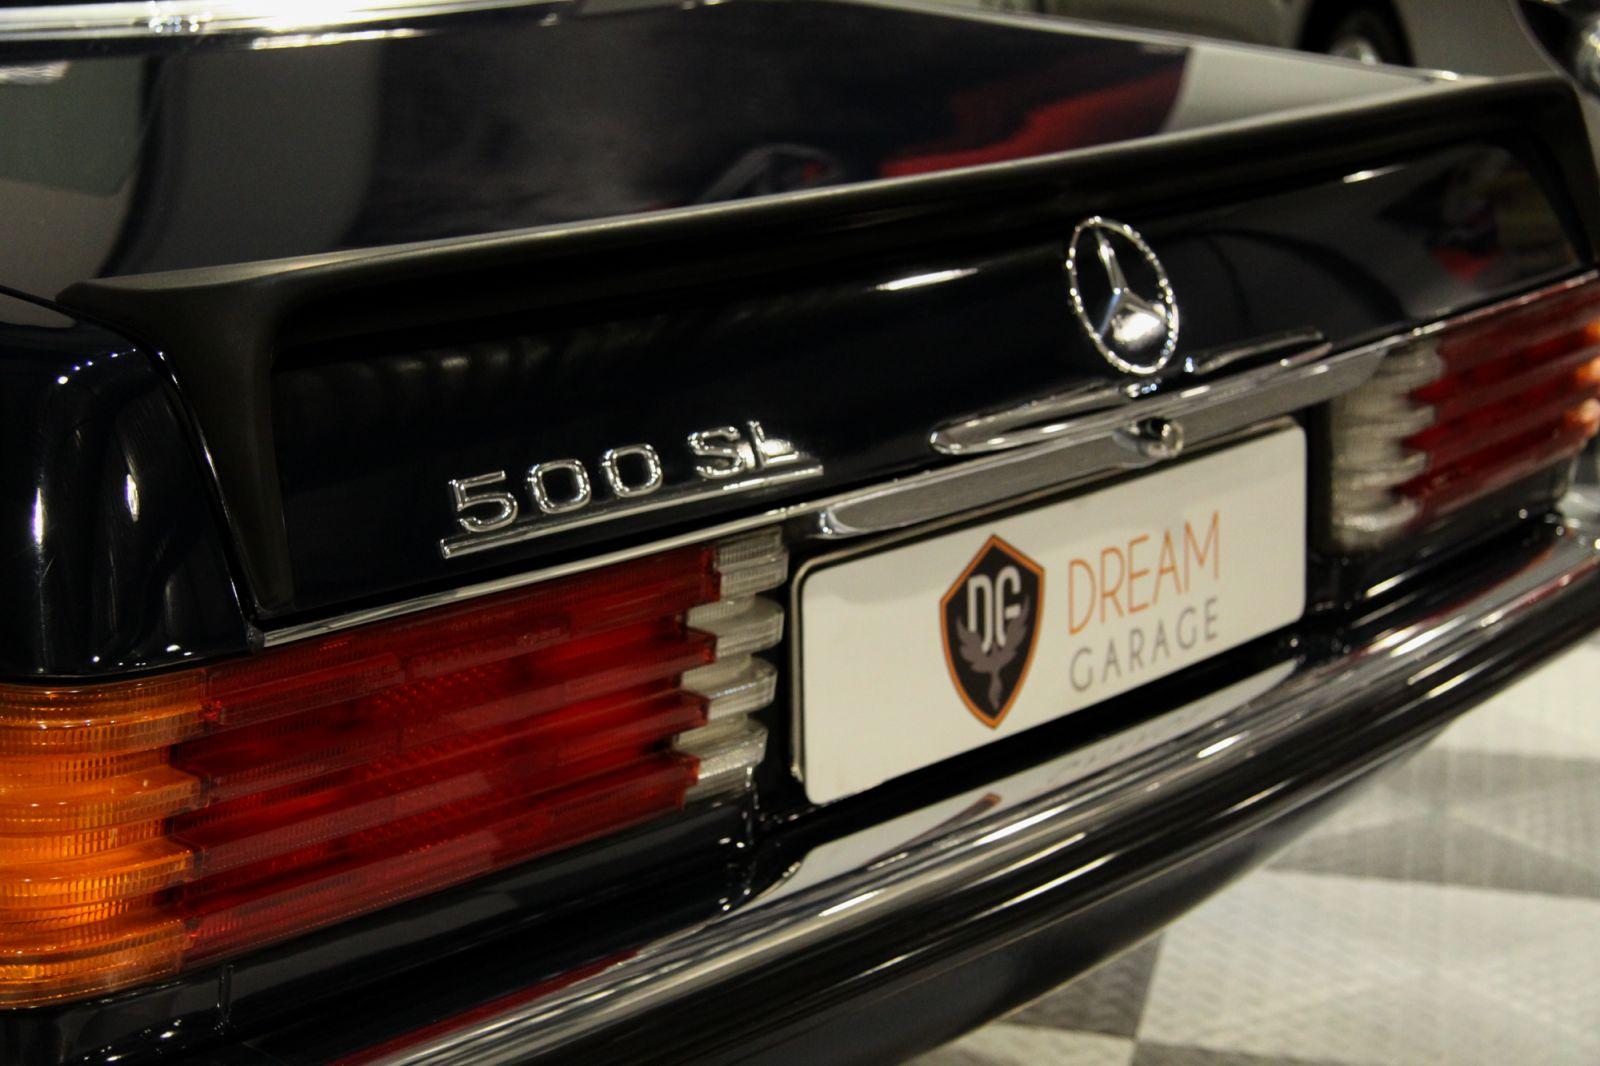 Dream garage sold carsmercedes mercedes benz 500 sl for Garage agree mercedes